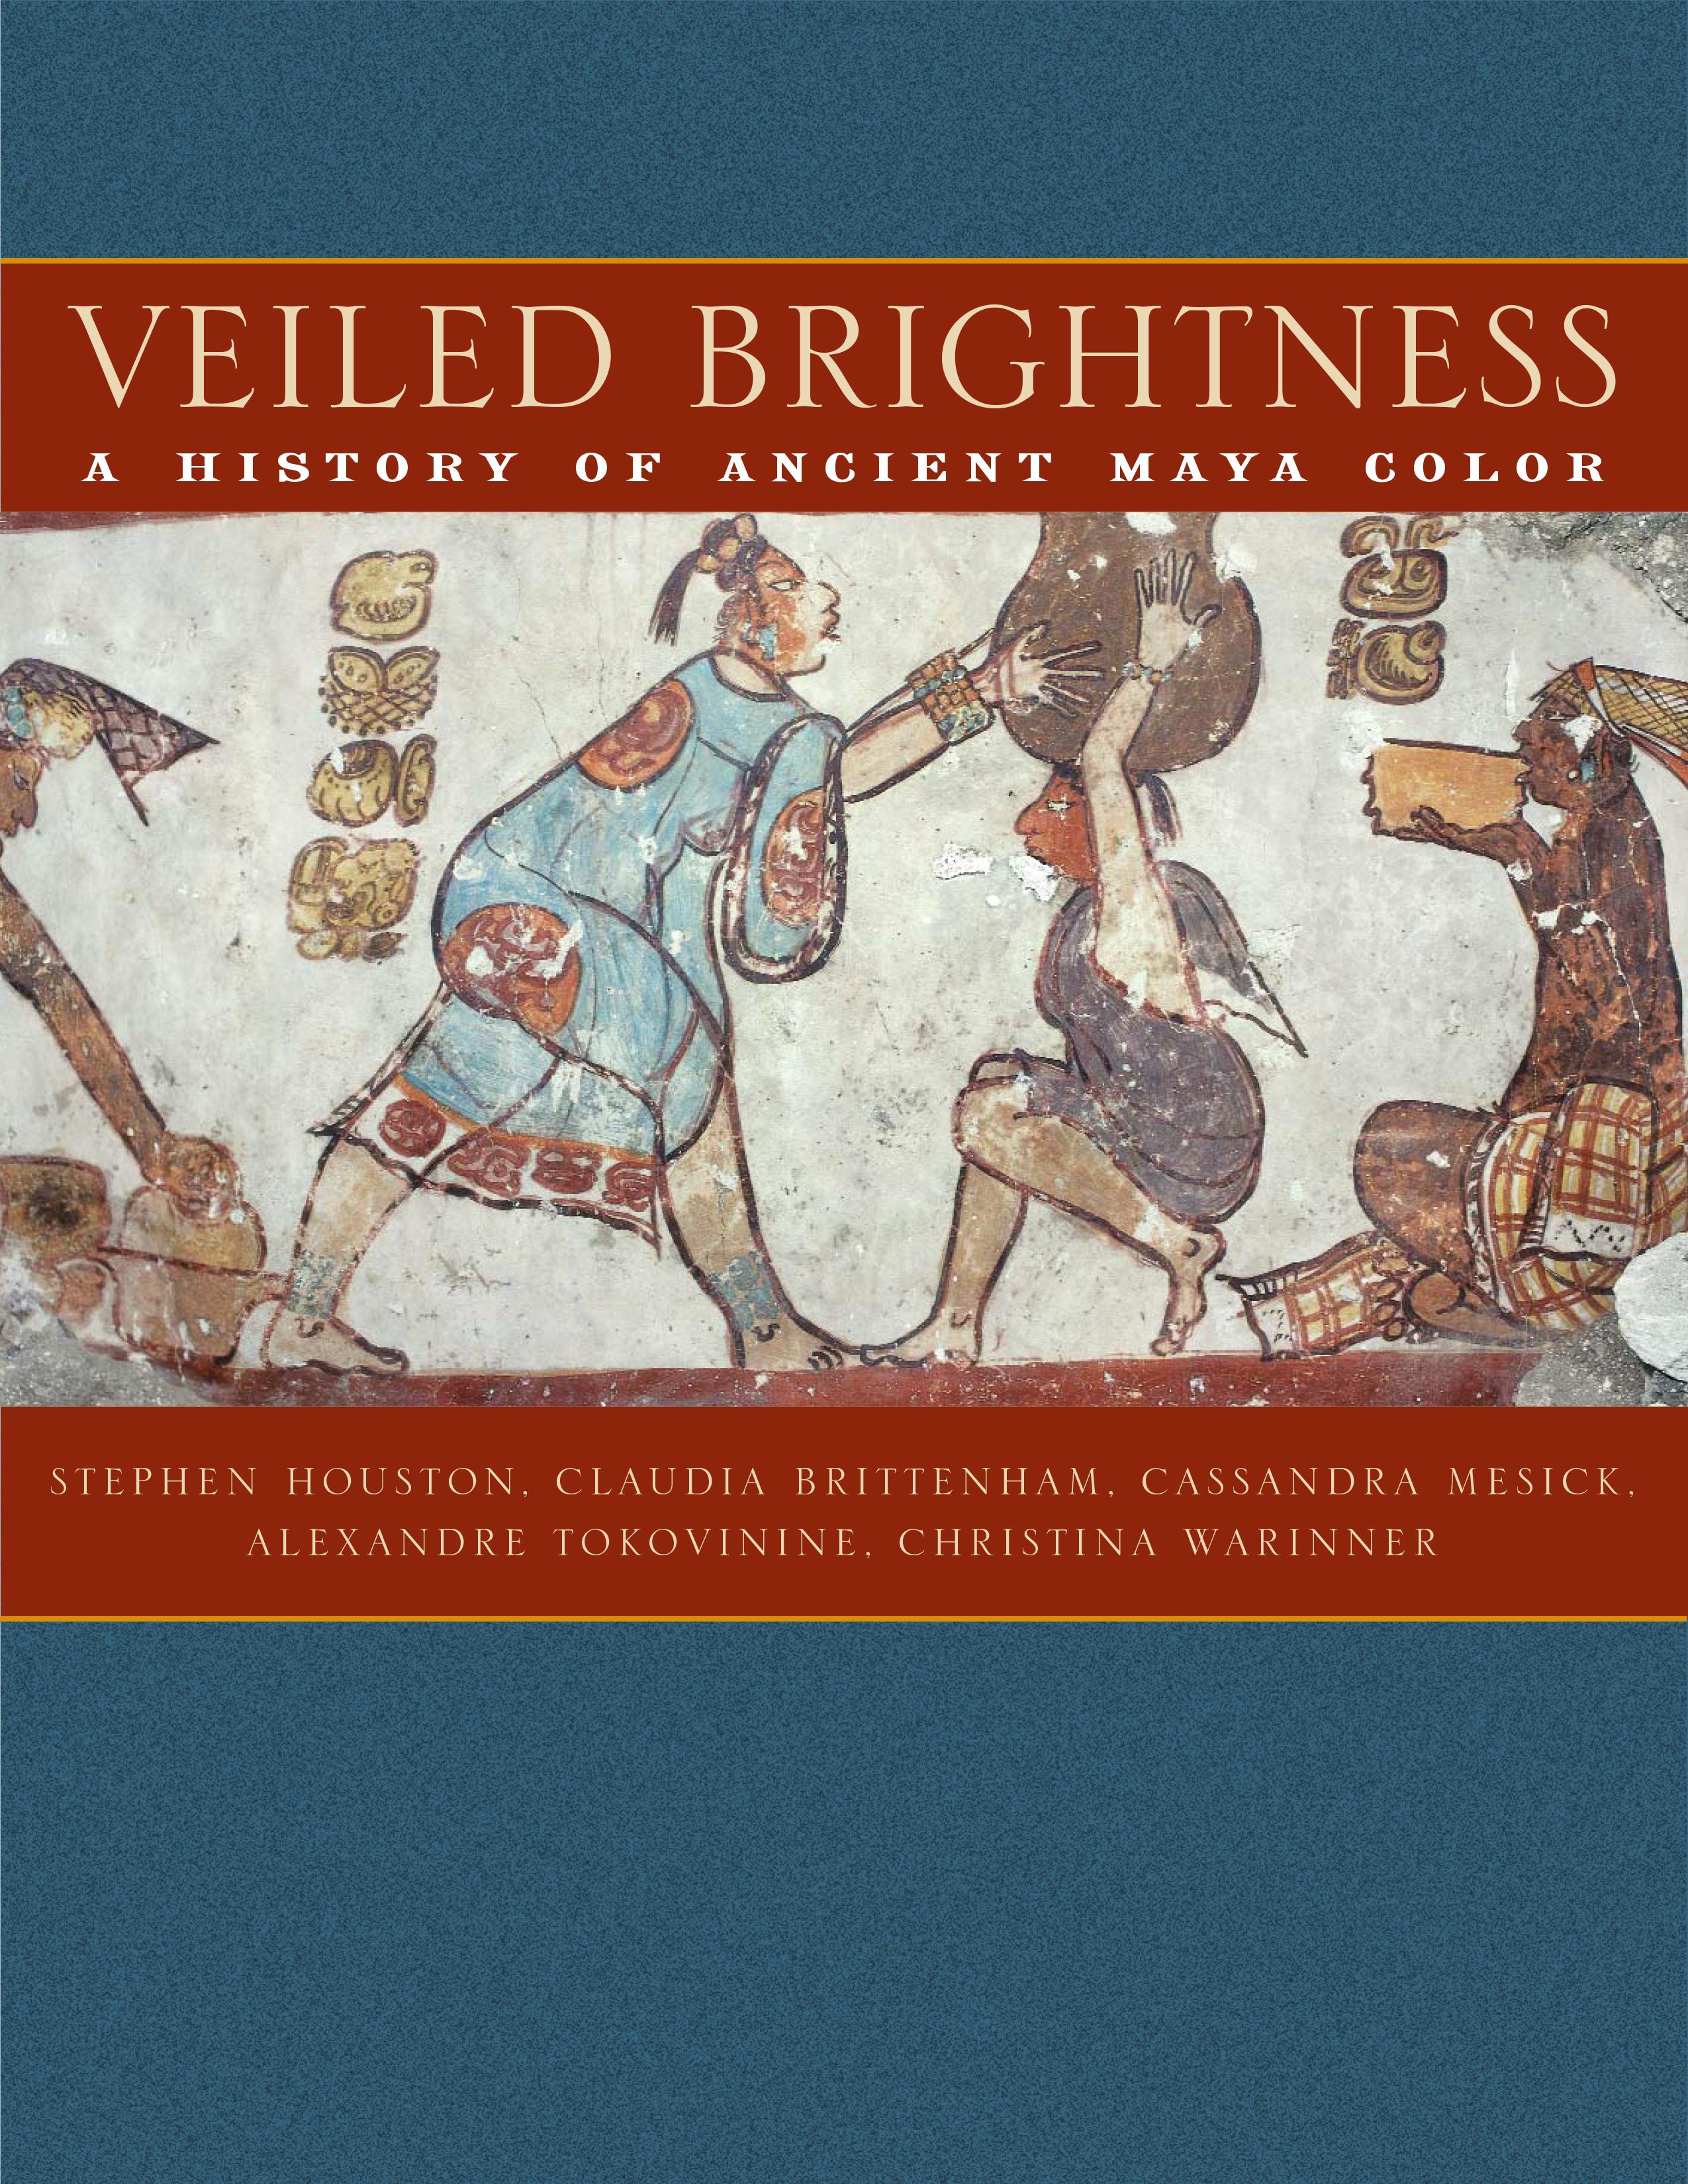 Veiled Brightness